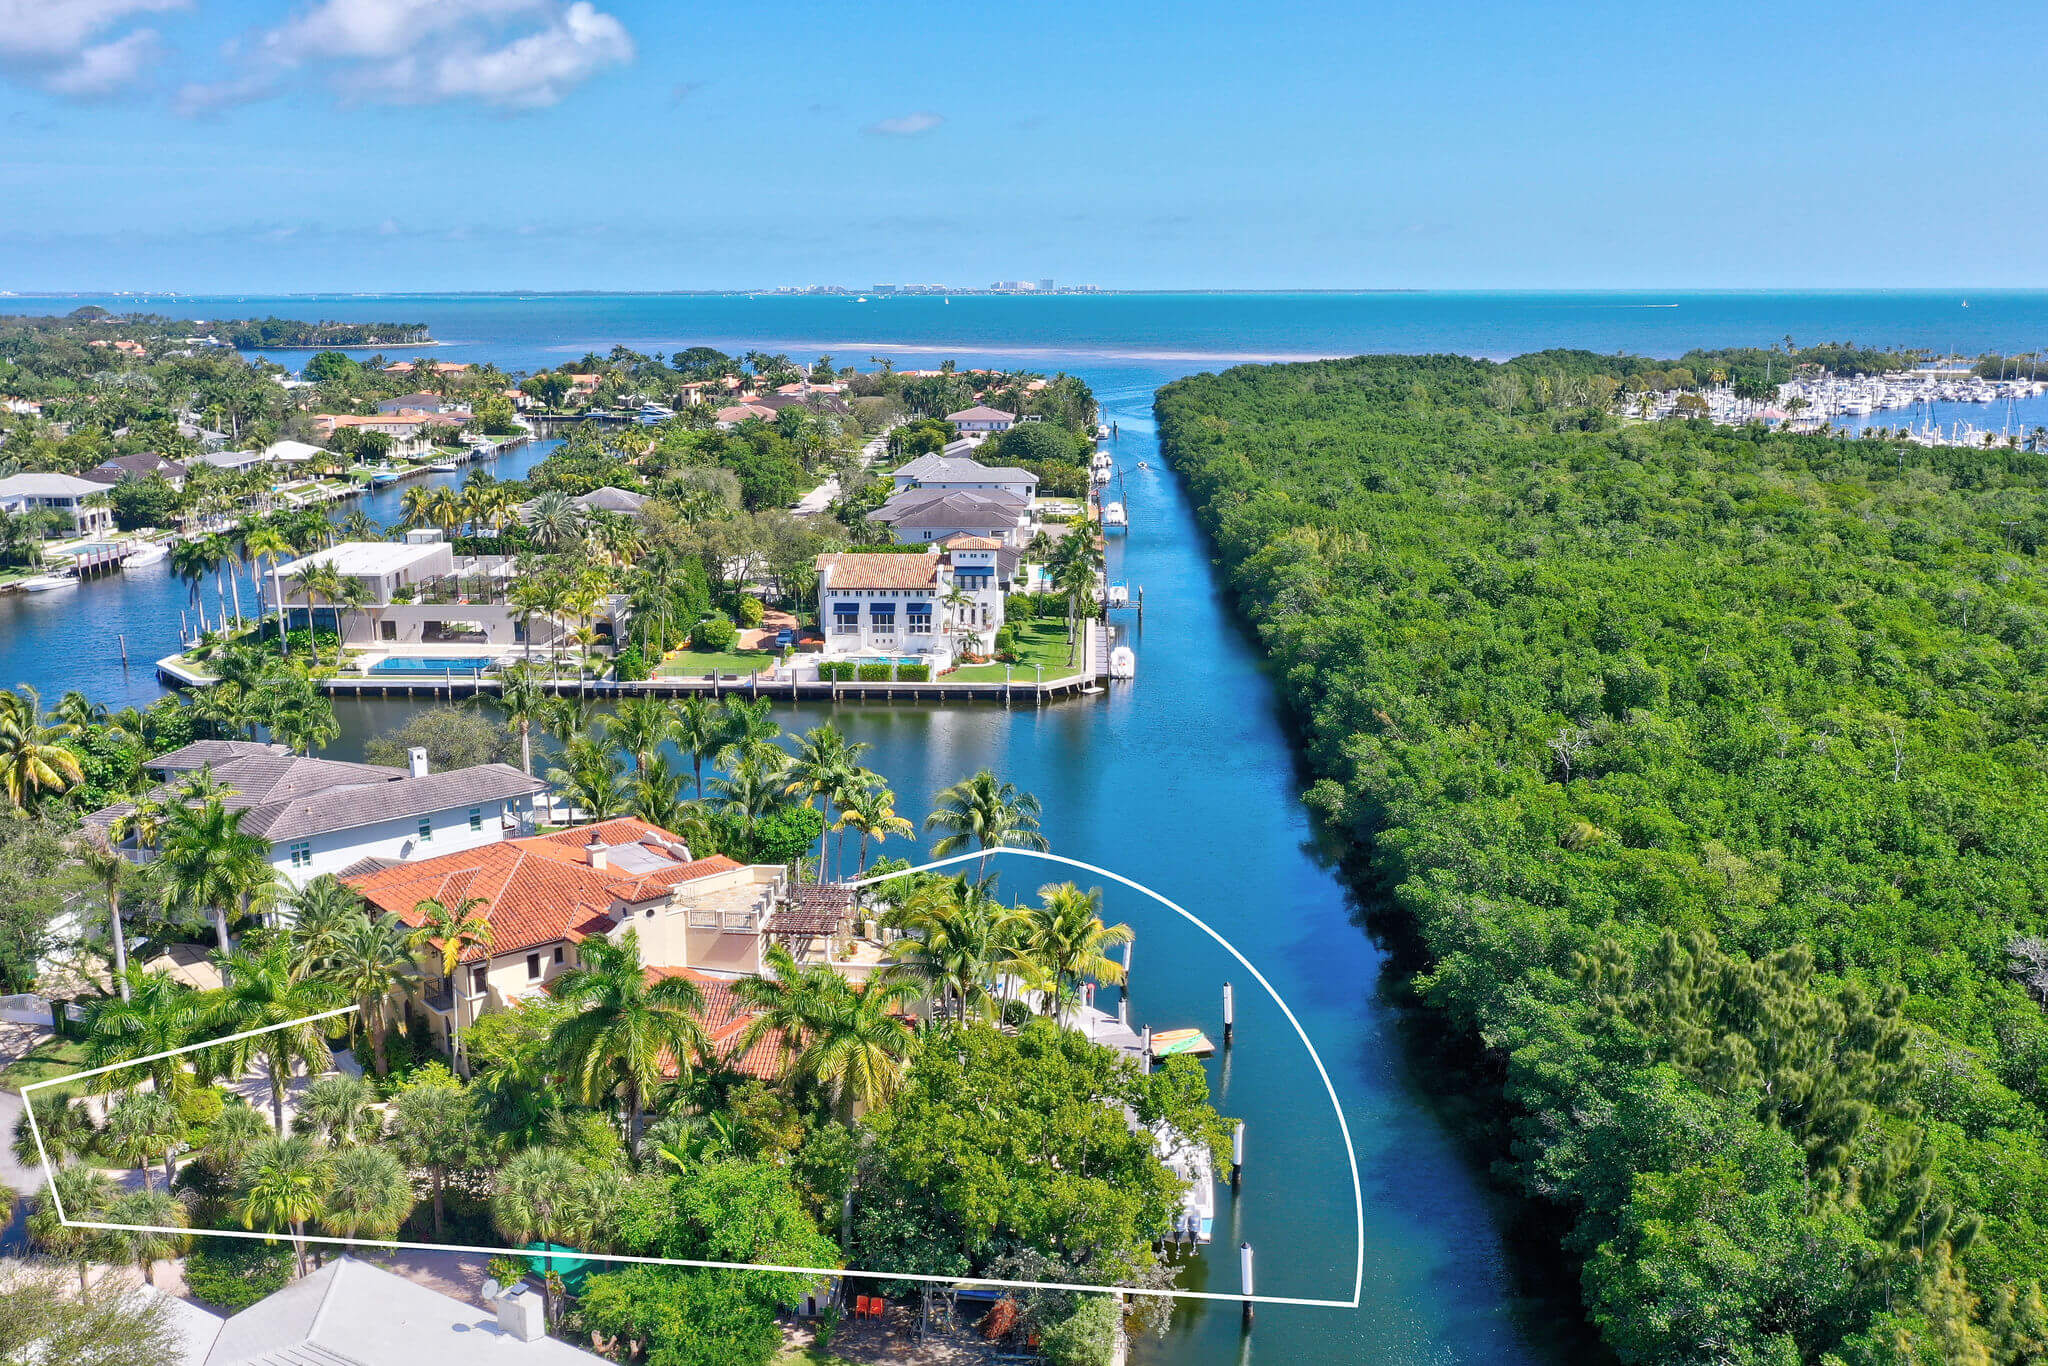 12_outline_photo_by_MiamiRealEstatePhotographers.com.jpg